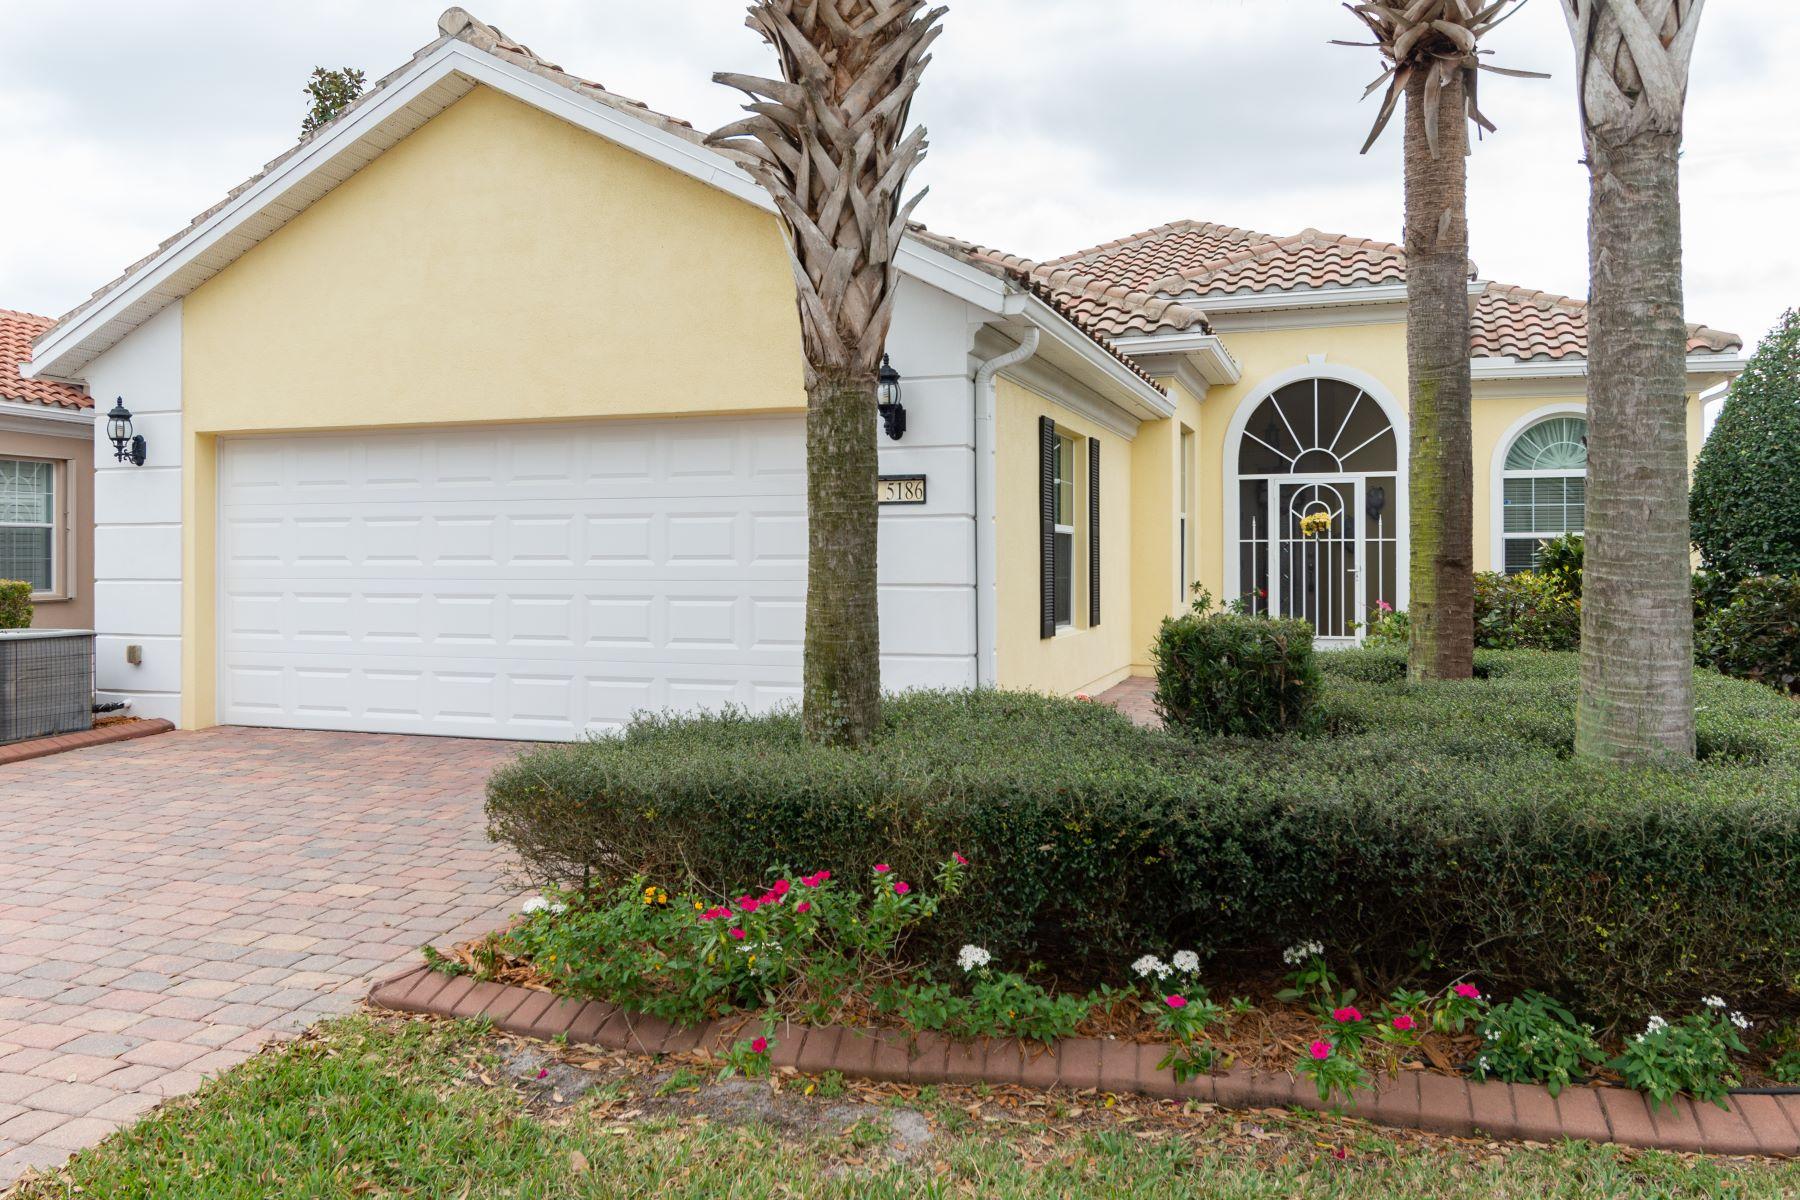 5186 Eleuthra Circle 5186 Eleuthra Circle Vero Beach, Floride 32967 États-Unis